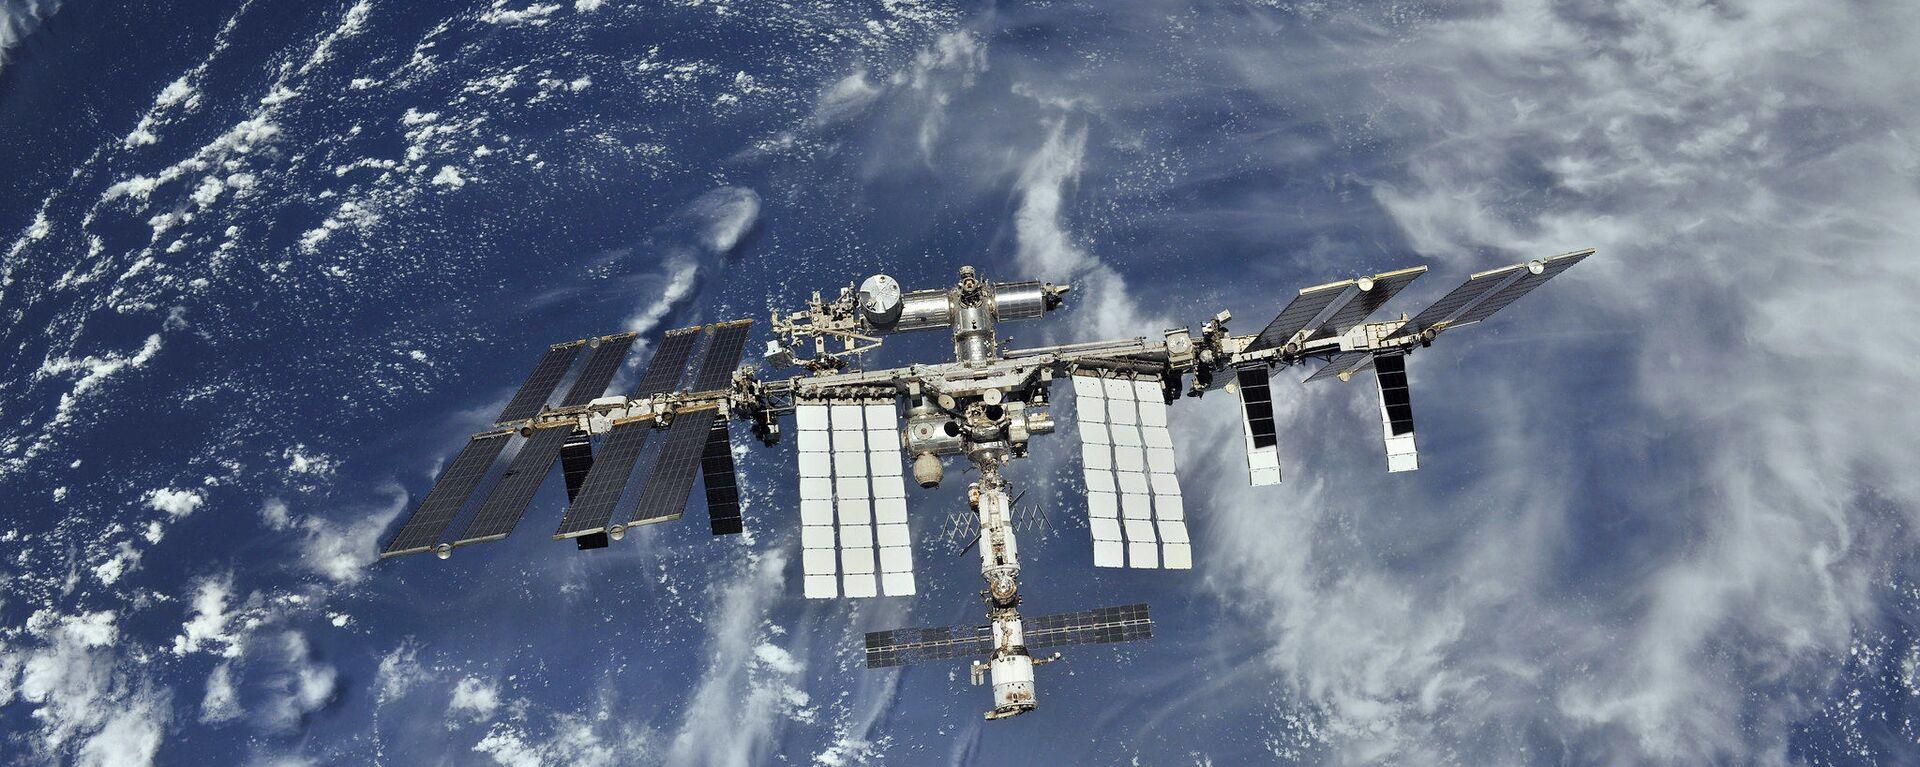 Estación Espacial Internacional (EEI) - Sputnik Mundo, 1920, 18.04.2021